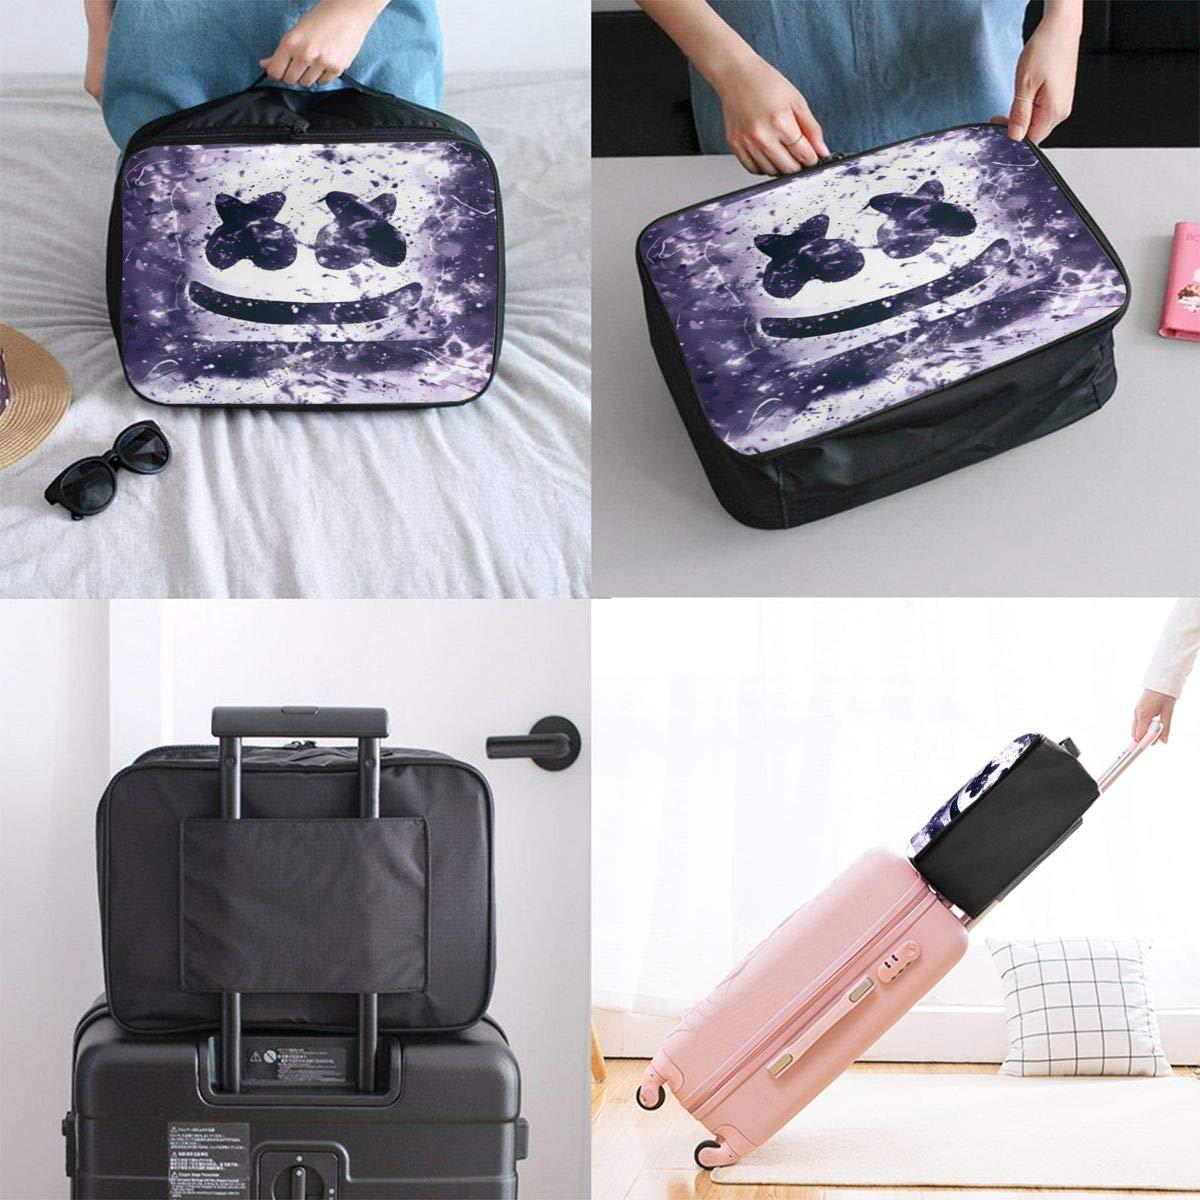 Mars/_hm/_ello Large Capacity Portable Luggage Bag Travel Lightweight Waterproof Storage Carry Luggage Duffel Tote Bag